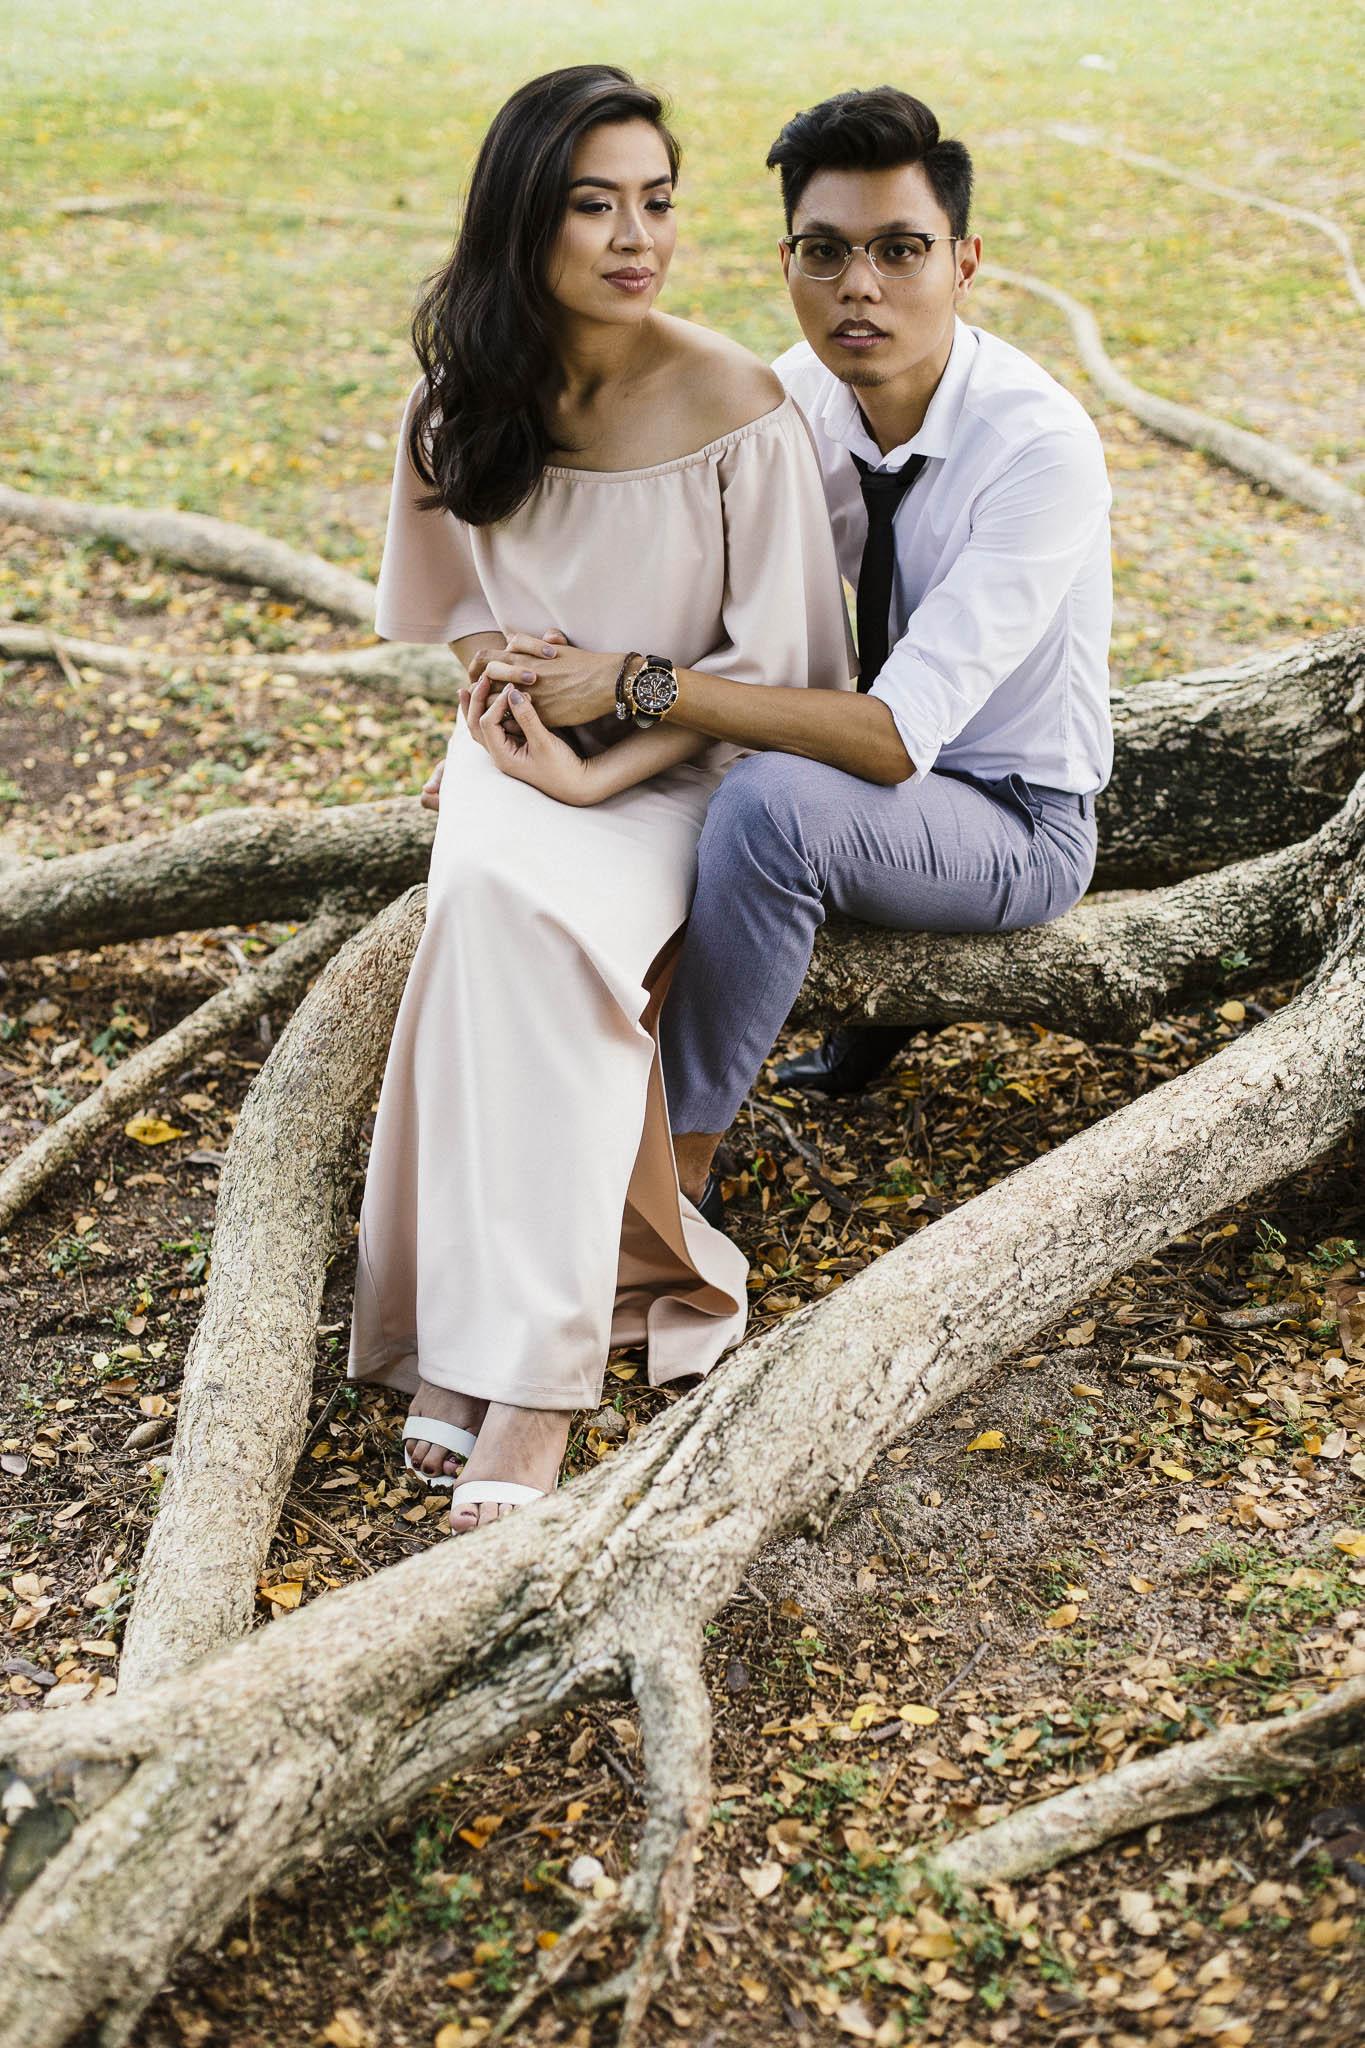 singapore-wedding-photographer-malay-travel-adli-tashah-25.jpg